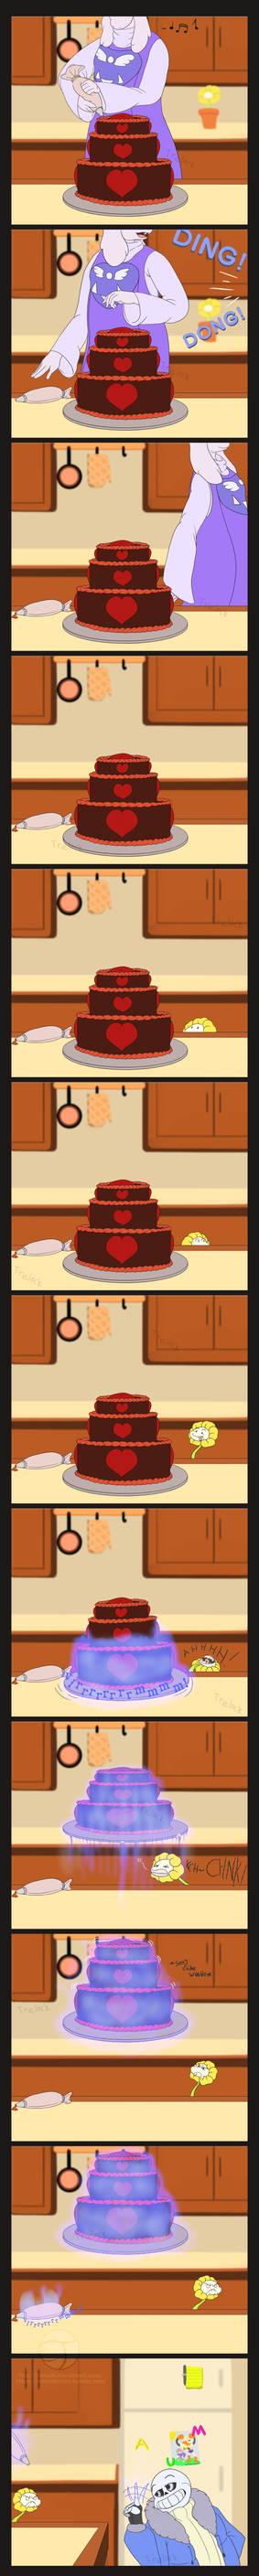 Frisk's Birthday- P1: The Cake!